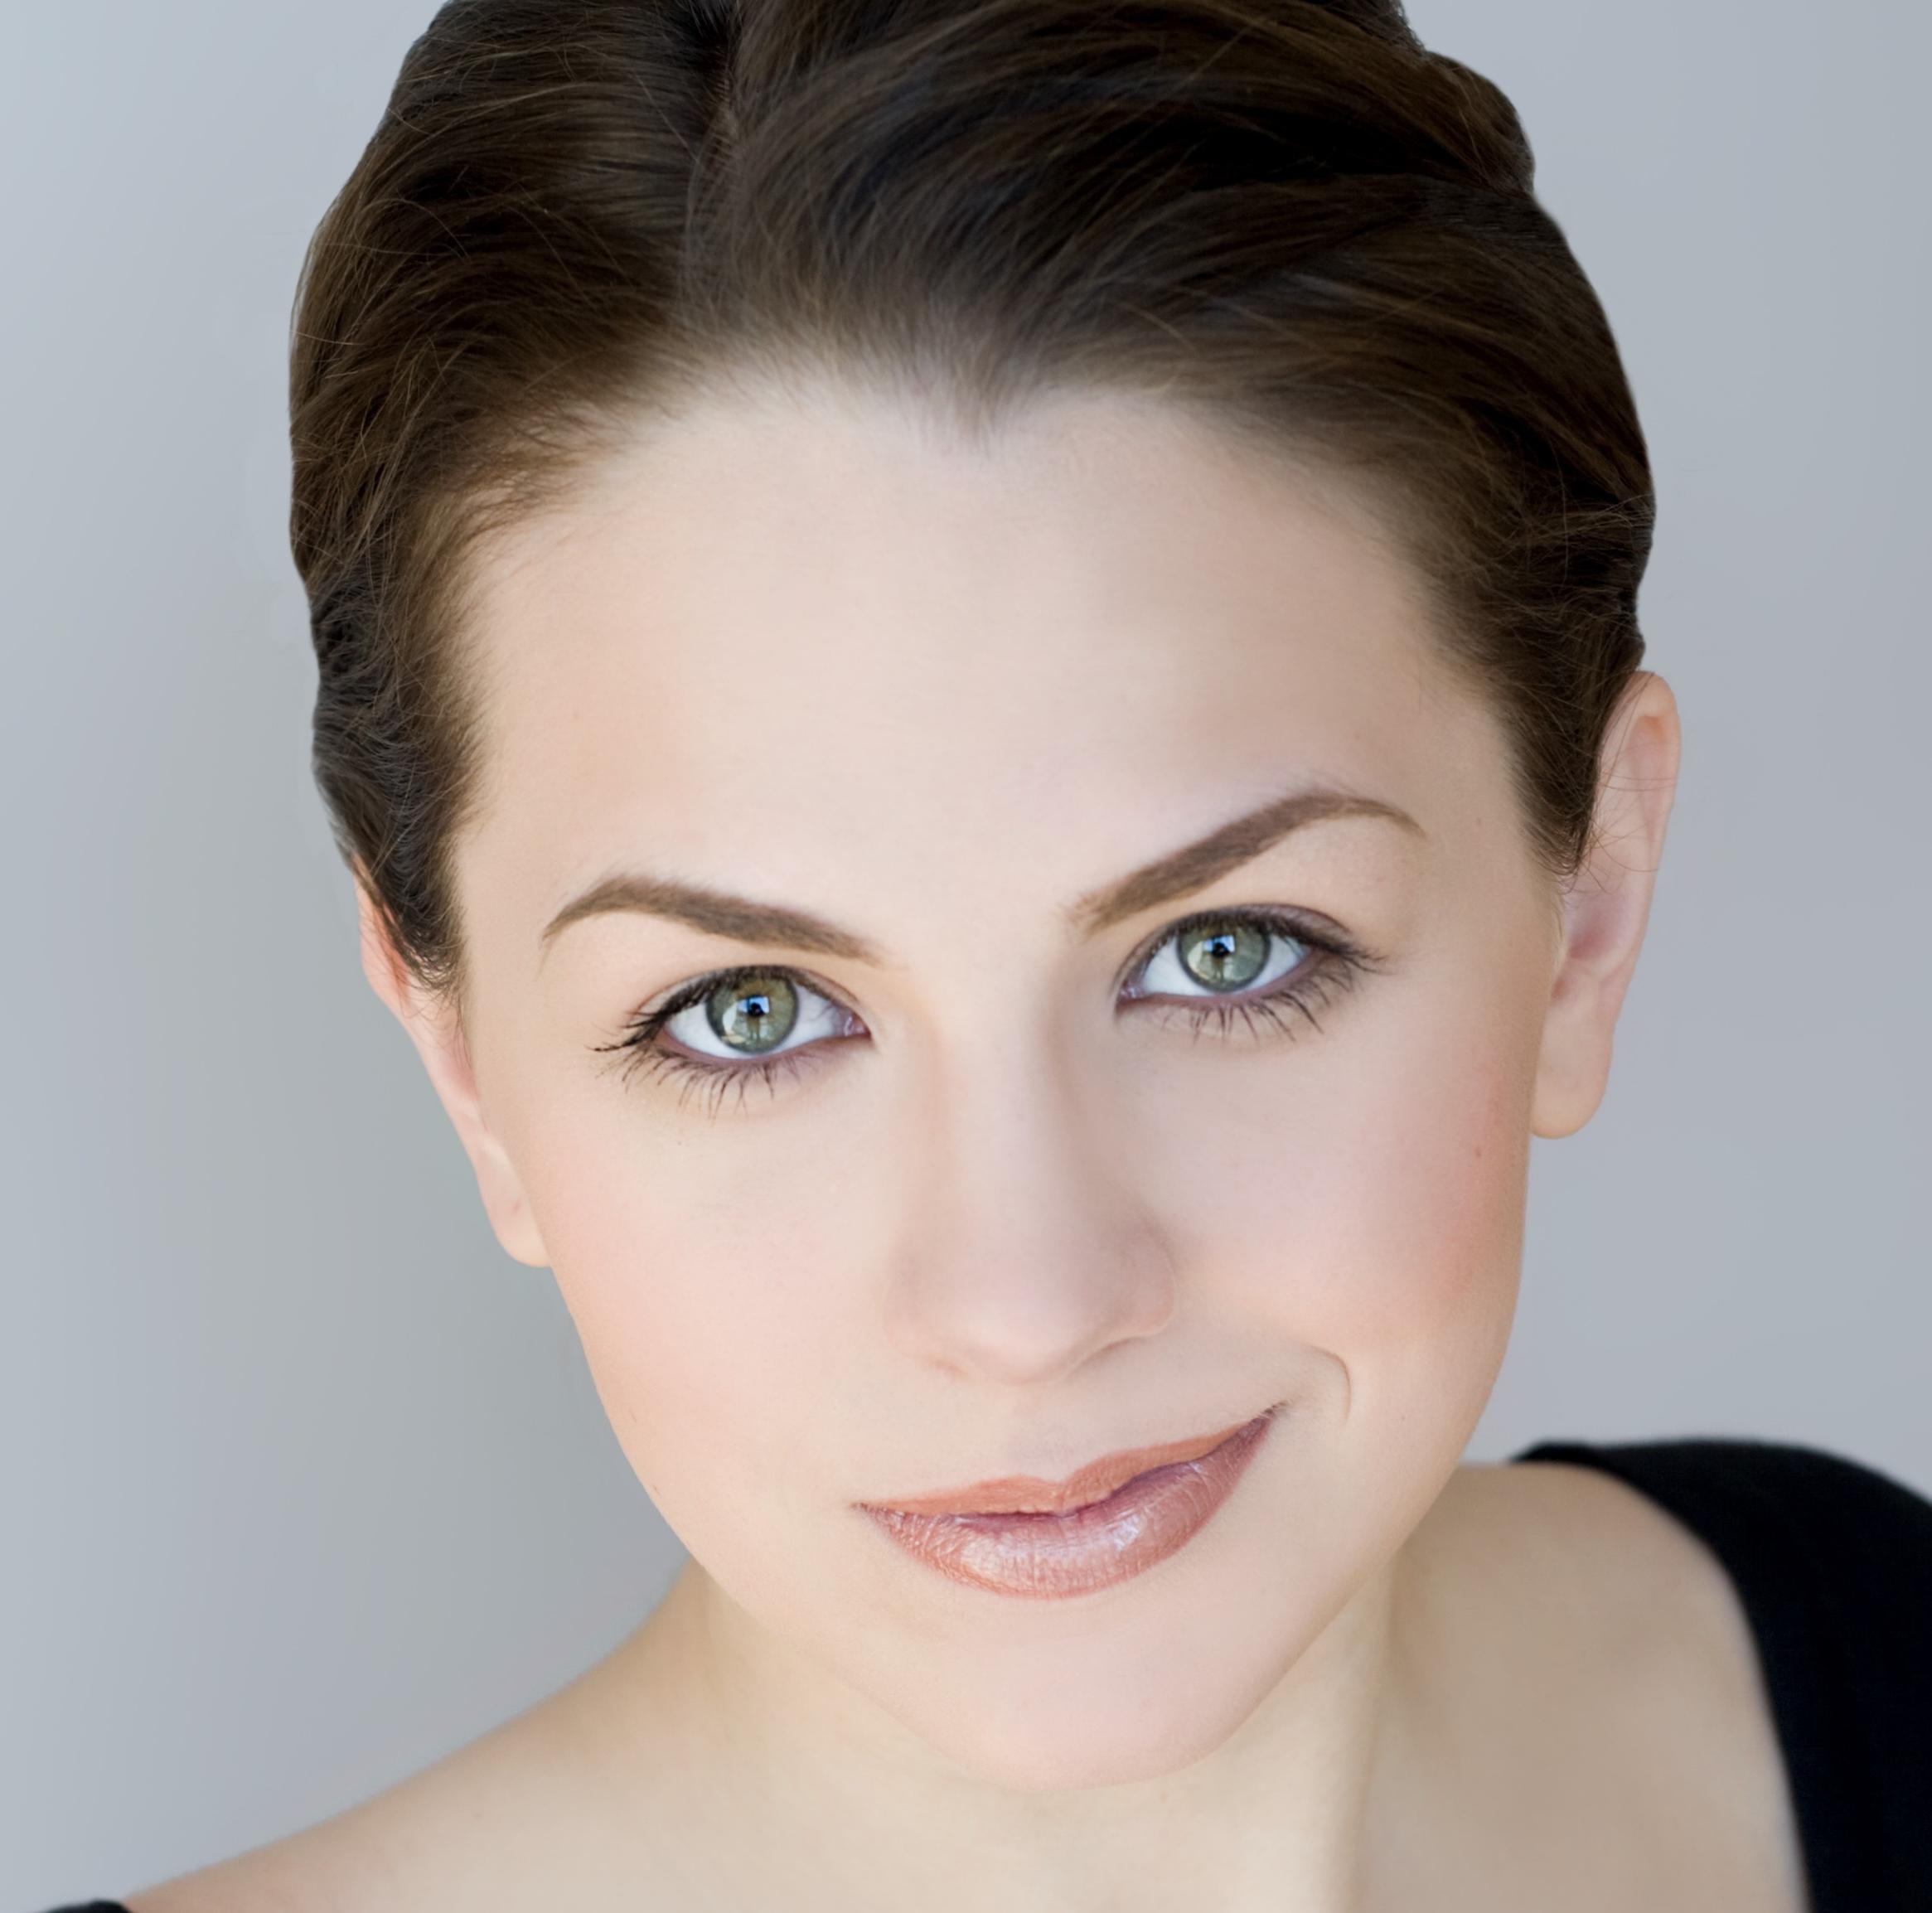 Erica Schuller